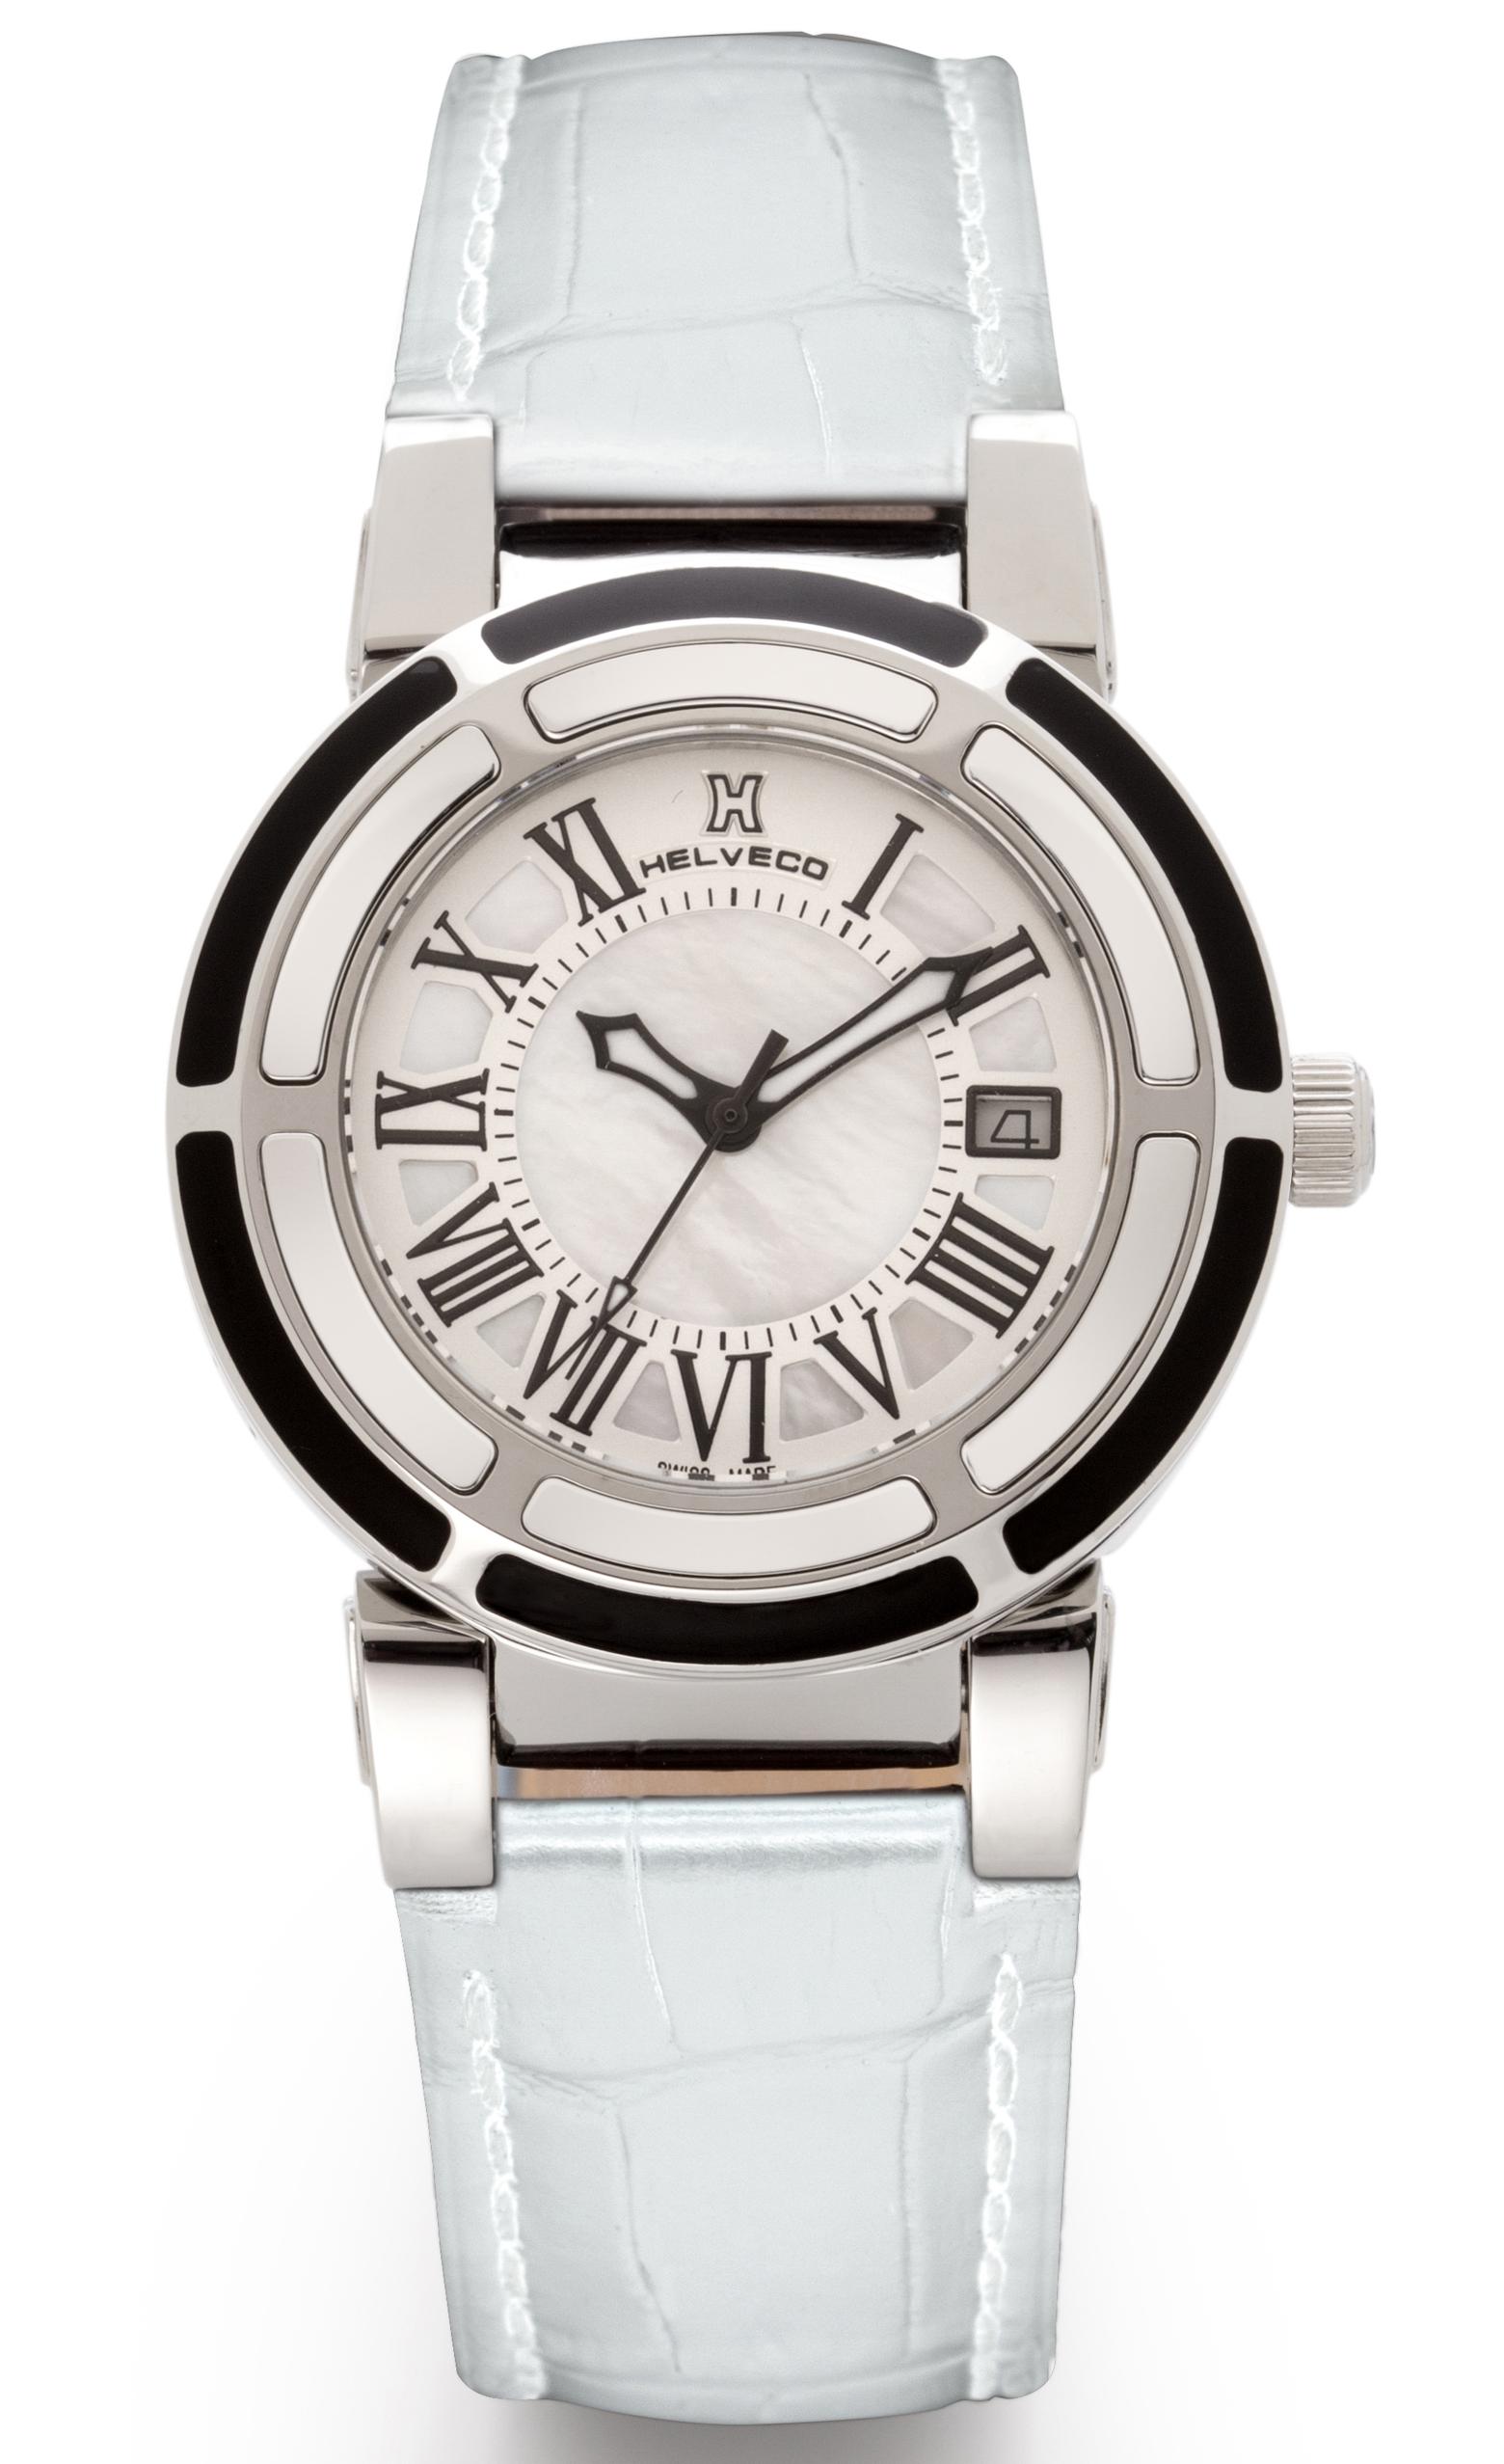 31bcef45d4e obrázek Dámské hodinky Helveco Wheel Crown - bílé